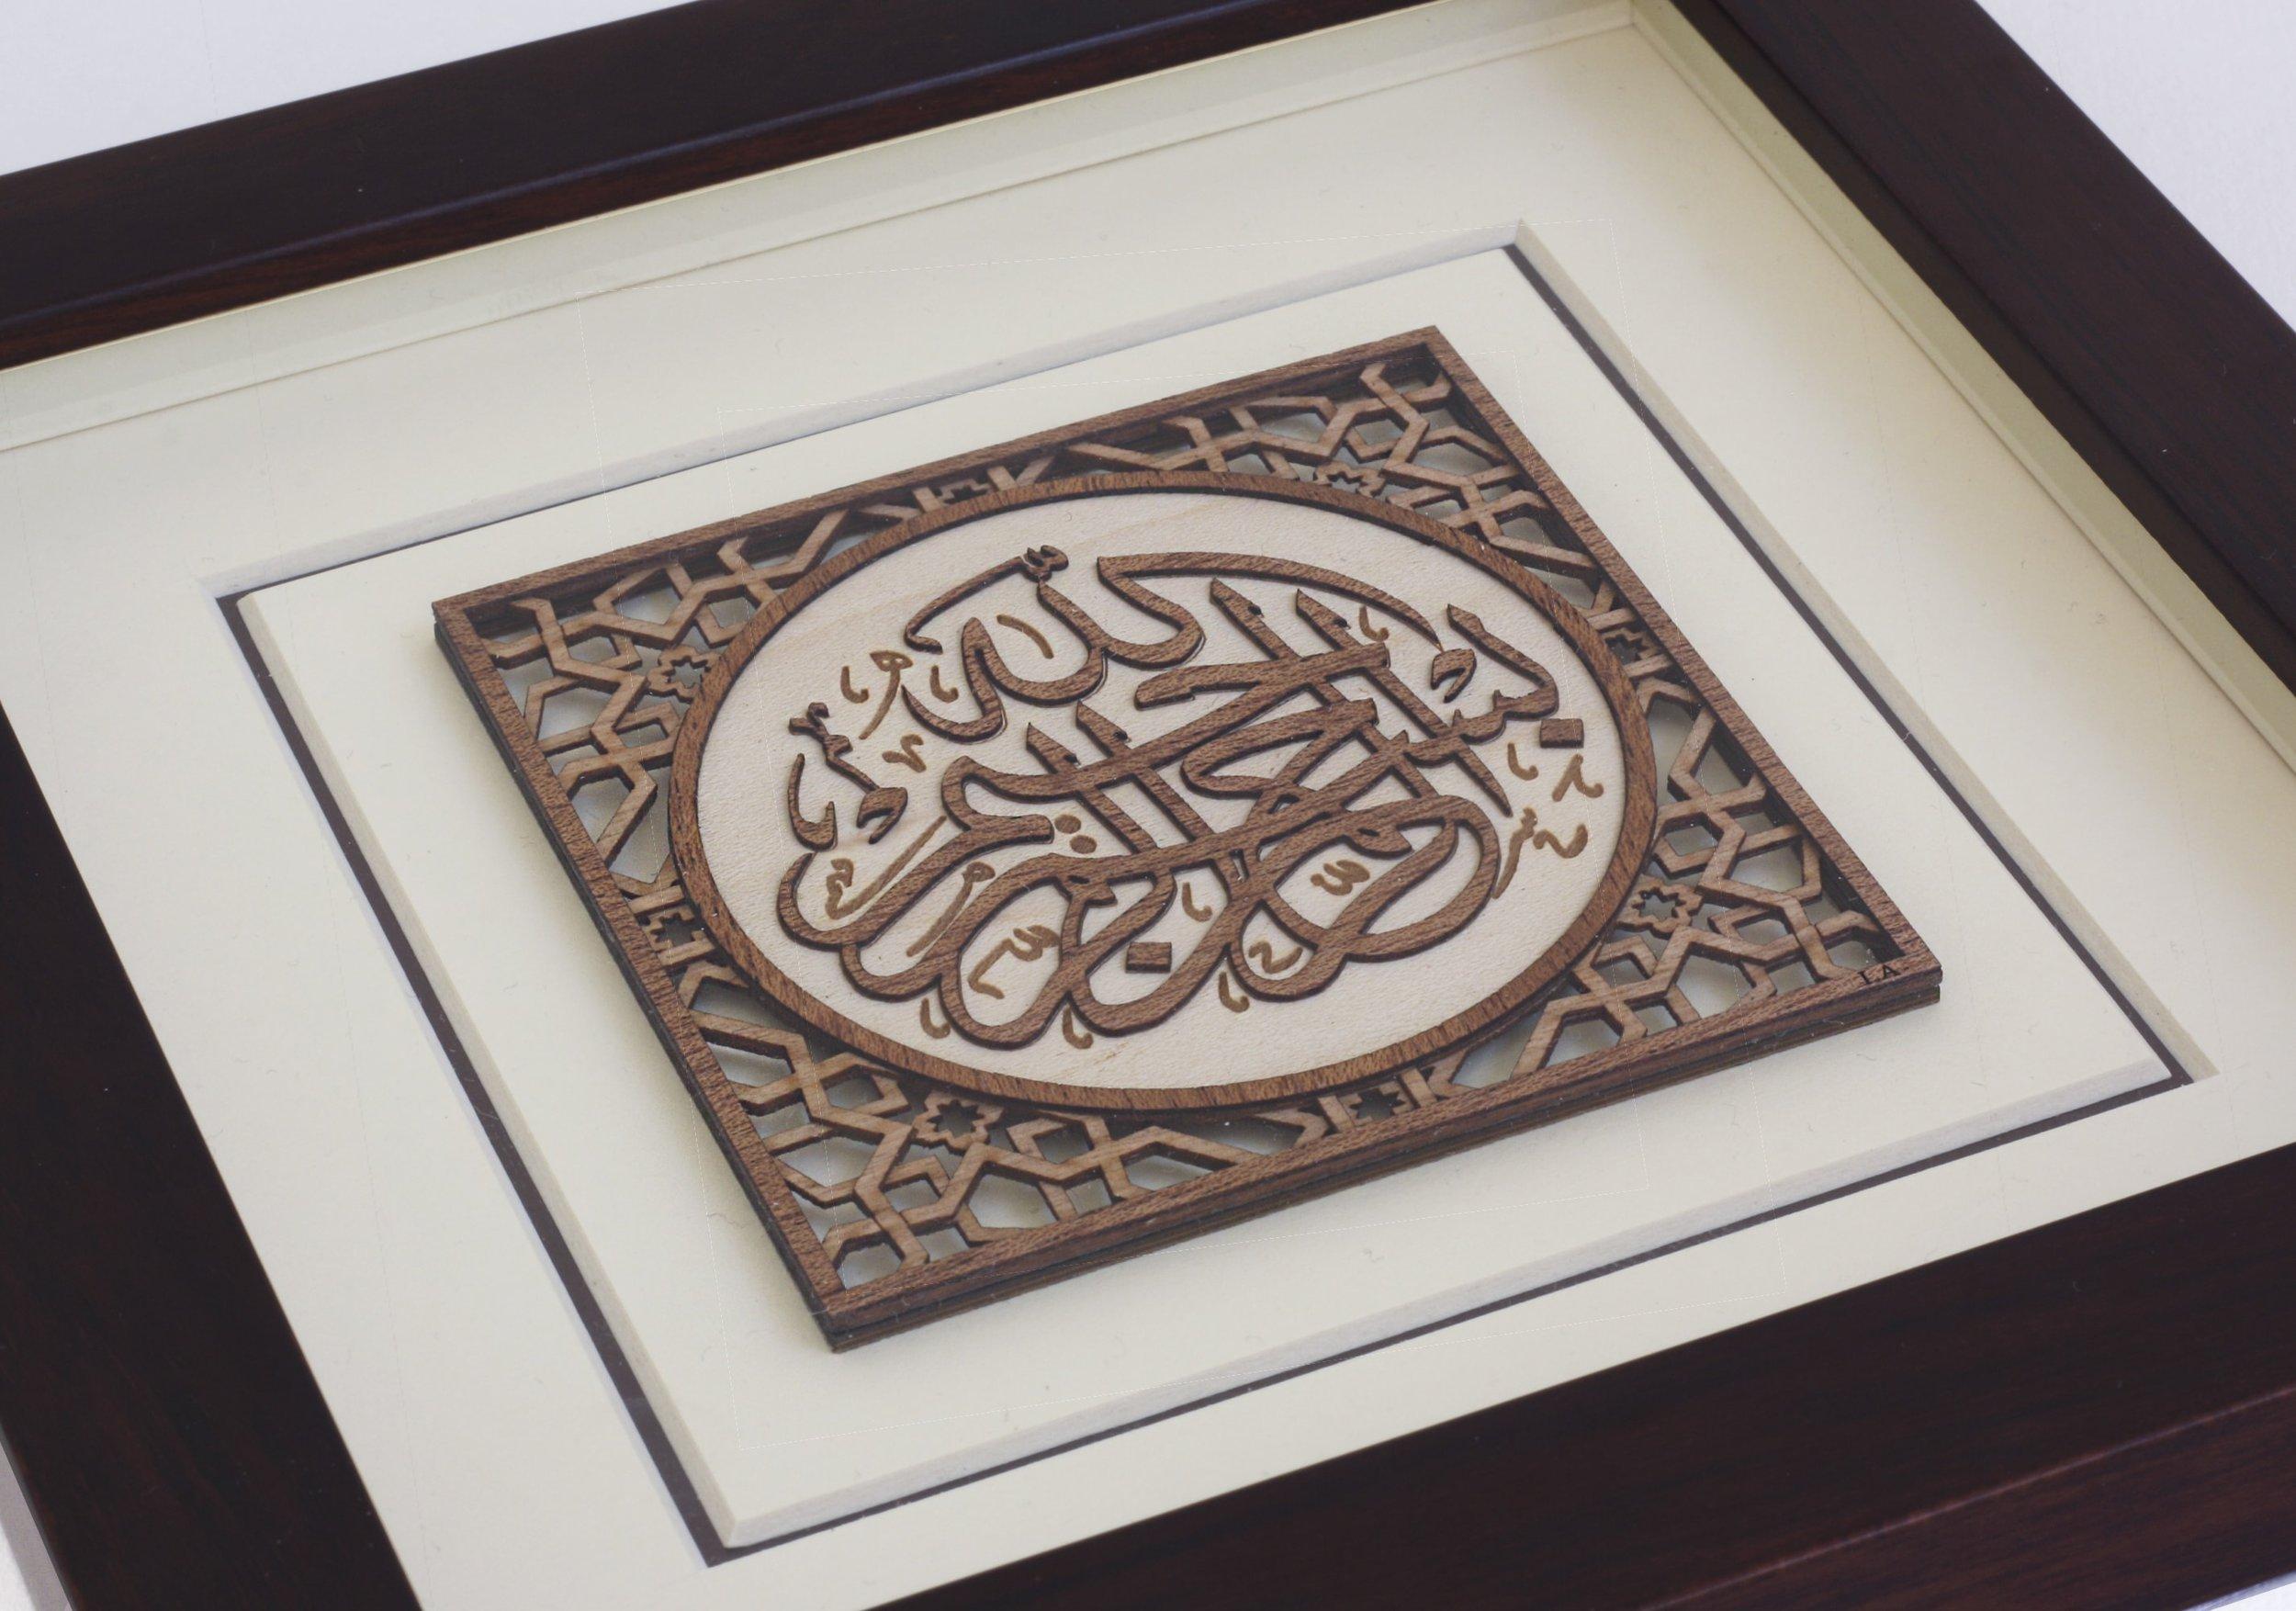 Arabic Calligraphy / Islamic Calligraphy wall art